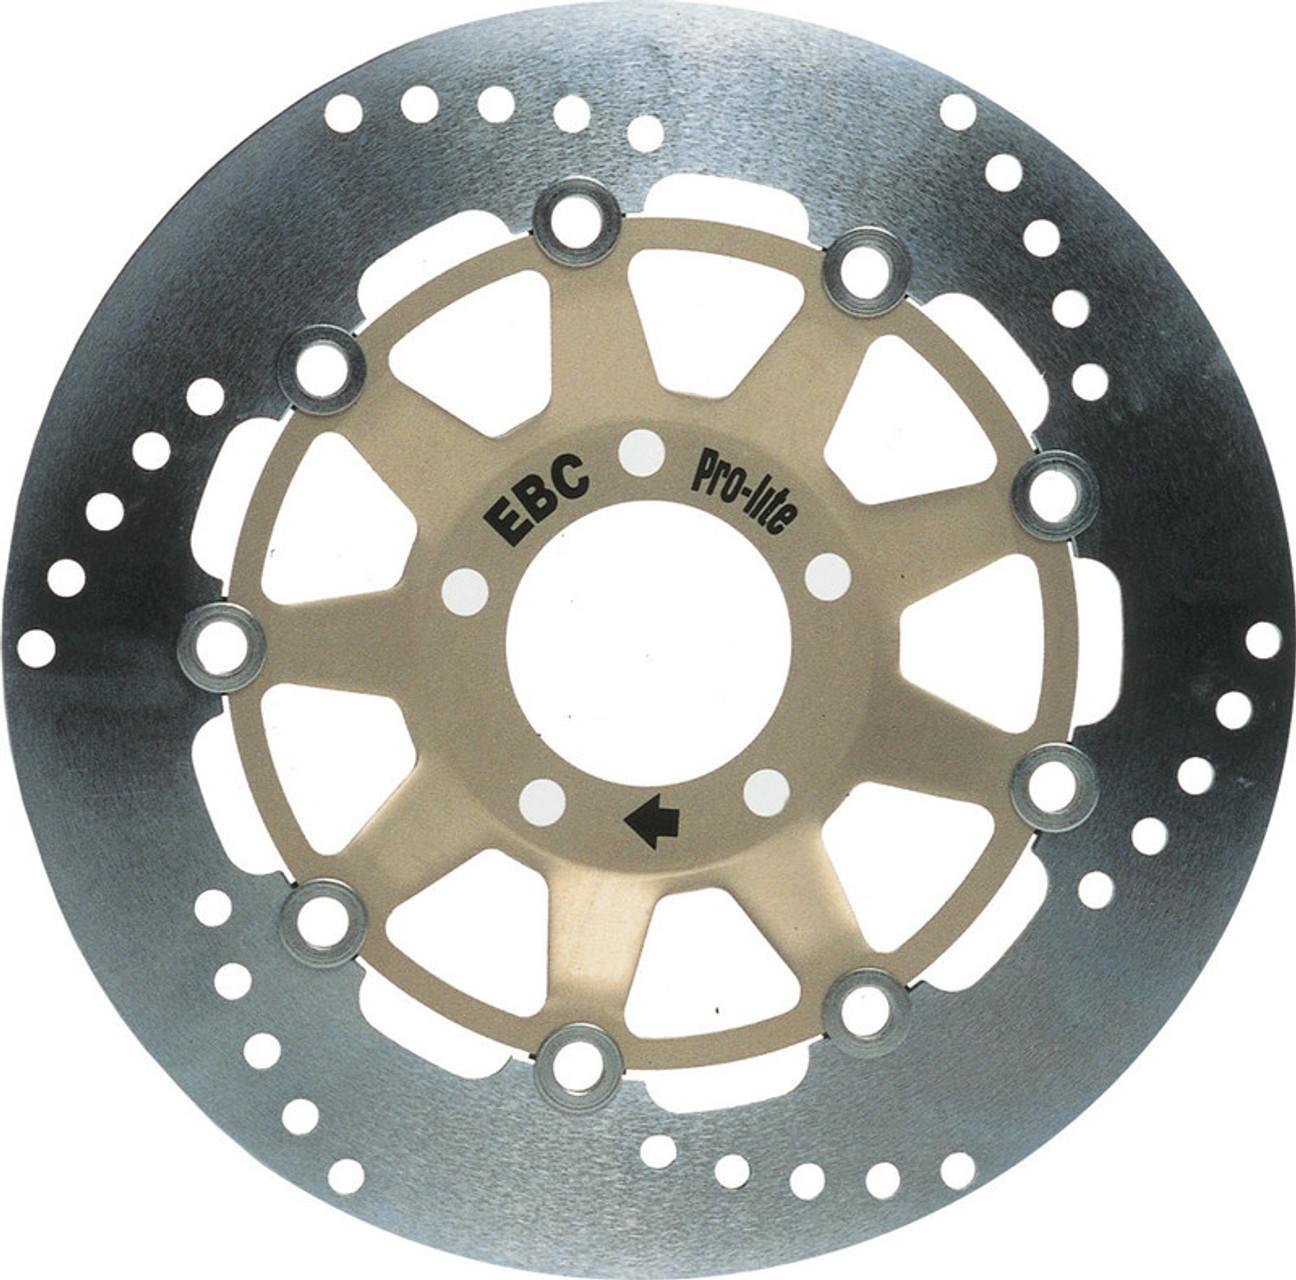 EBC Brakes MD4082 Brake Rotor